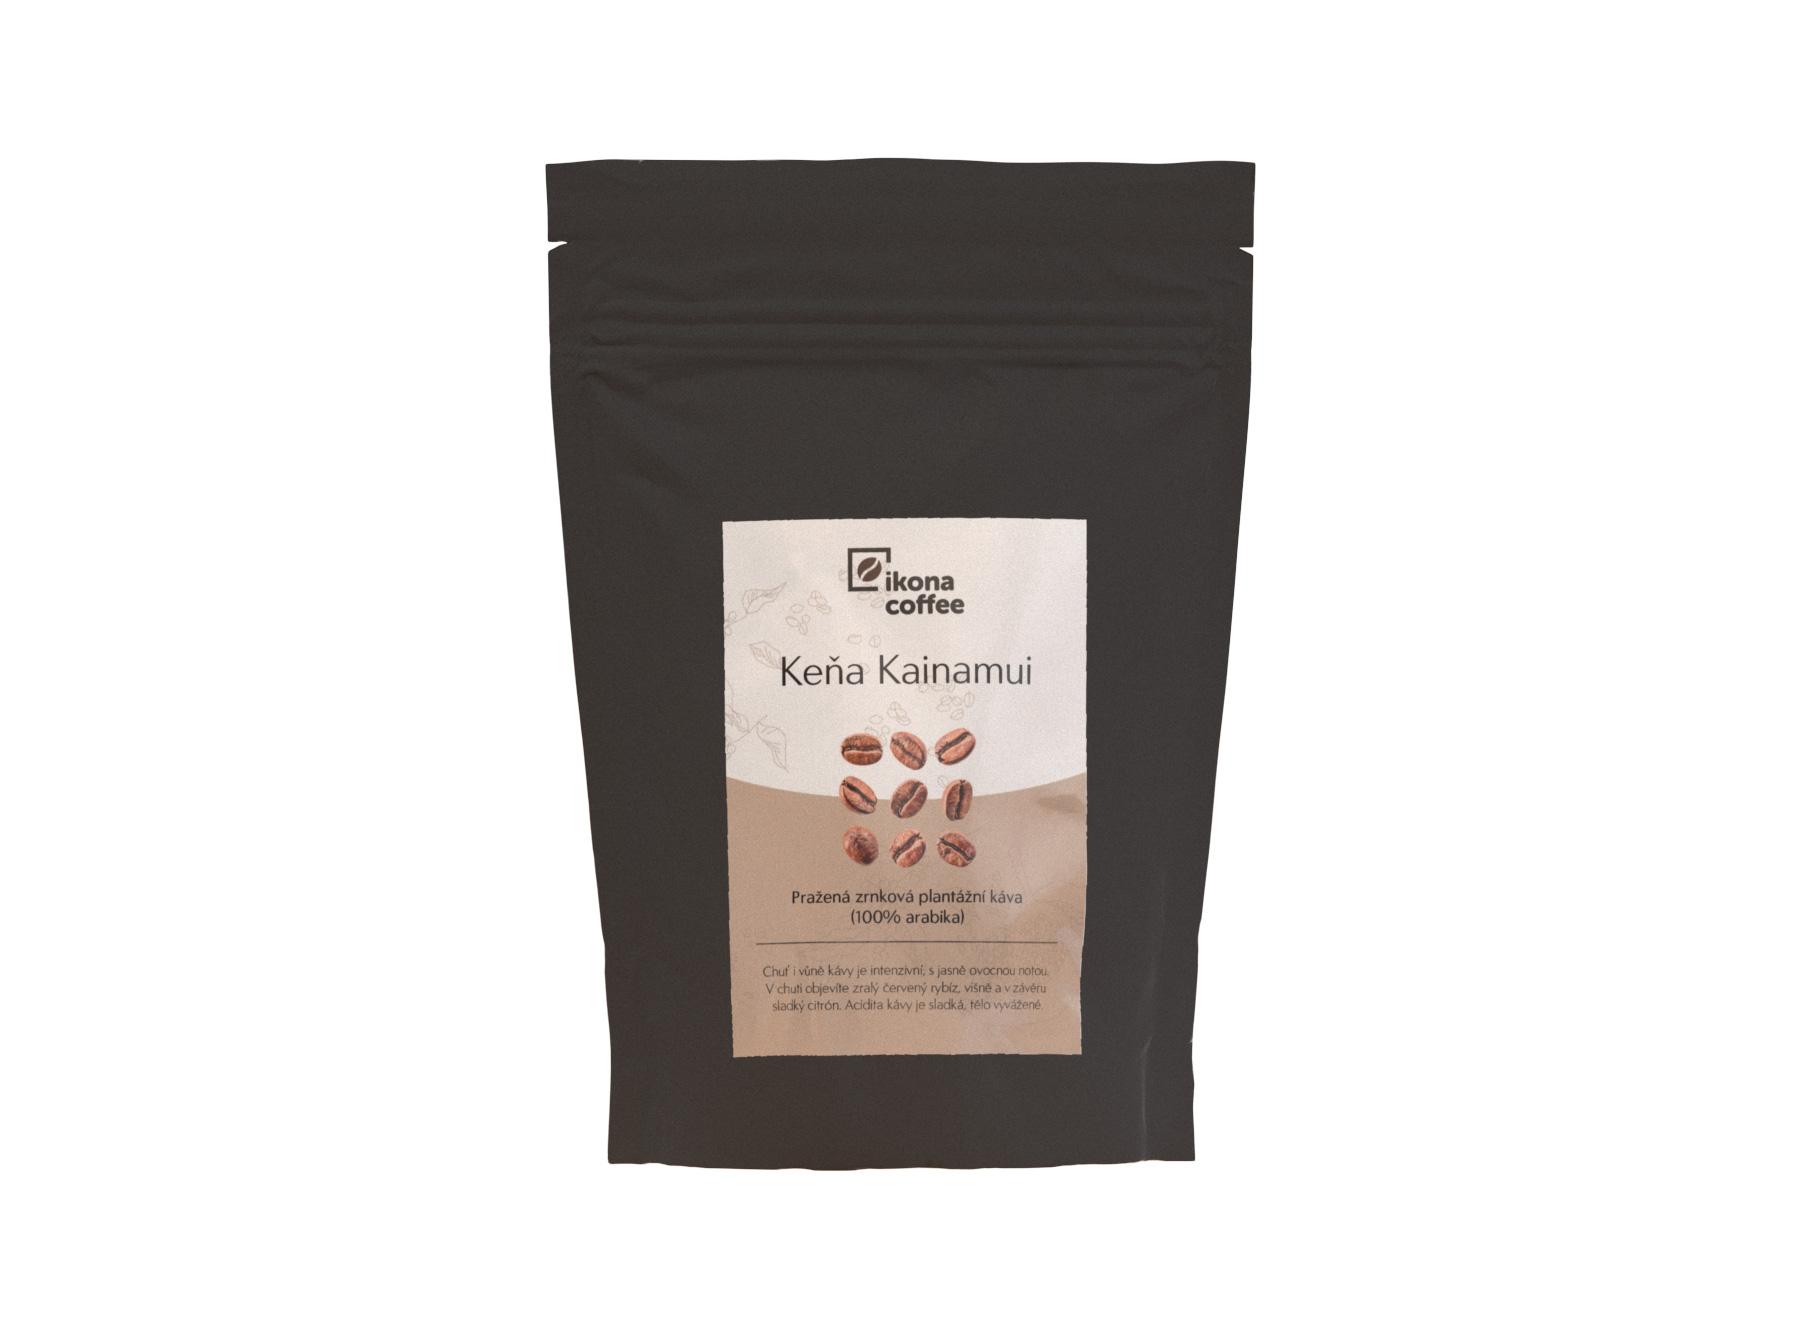 IKONA COFFEE Kenya Kainamui 150 g